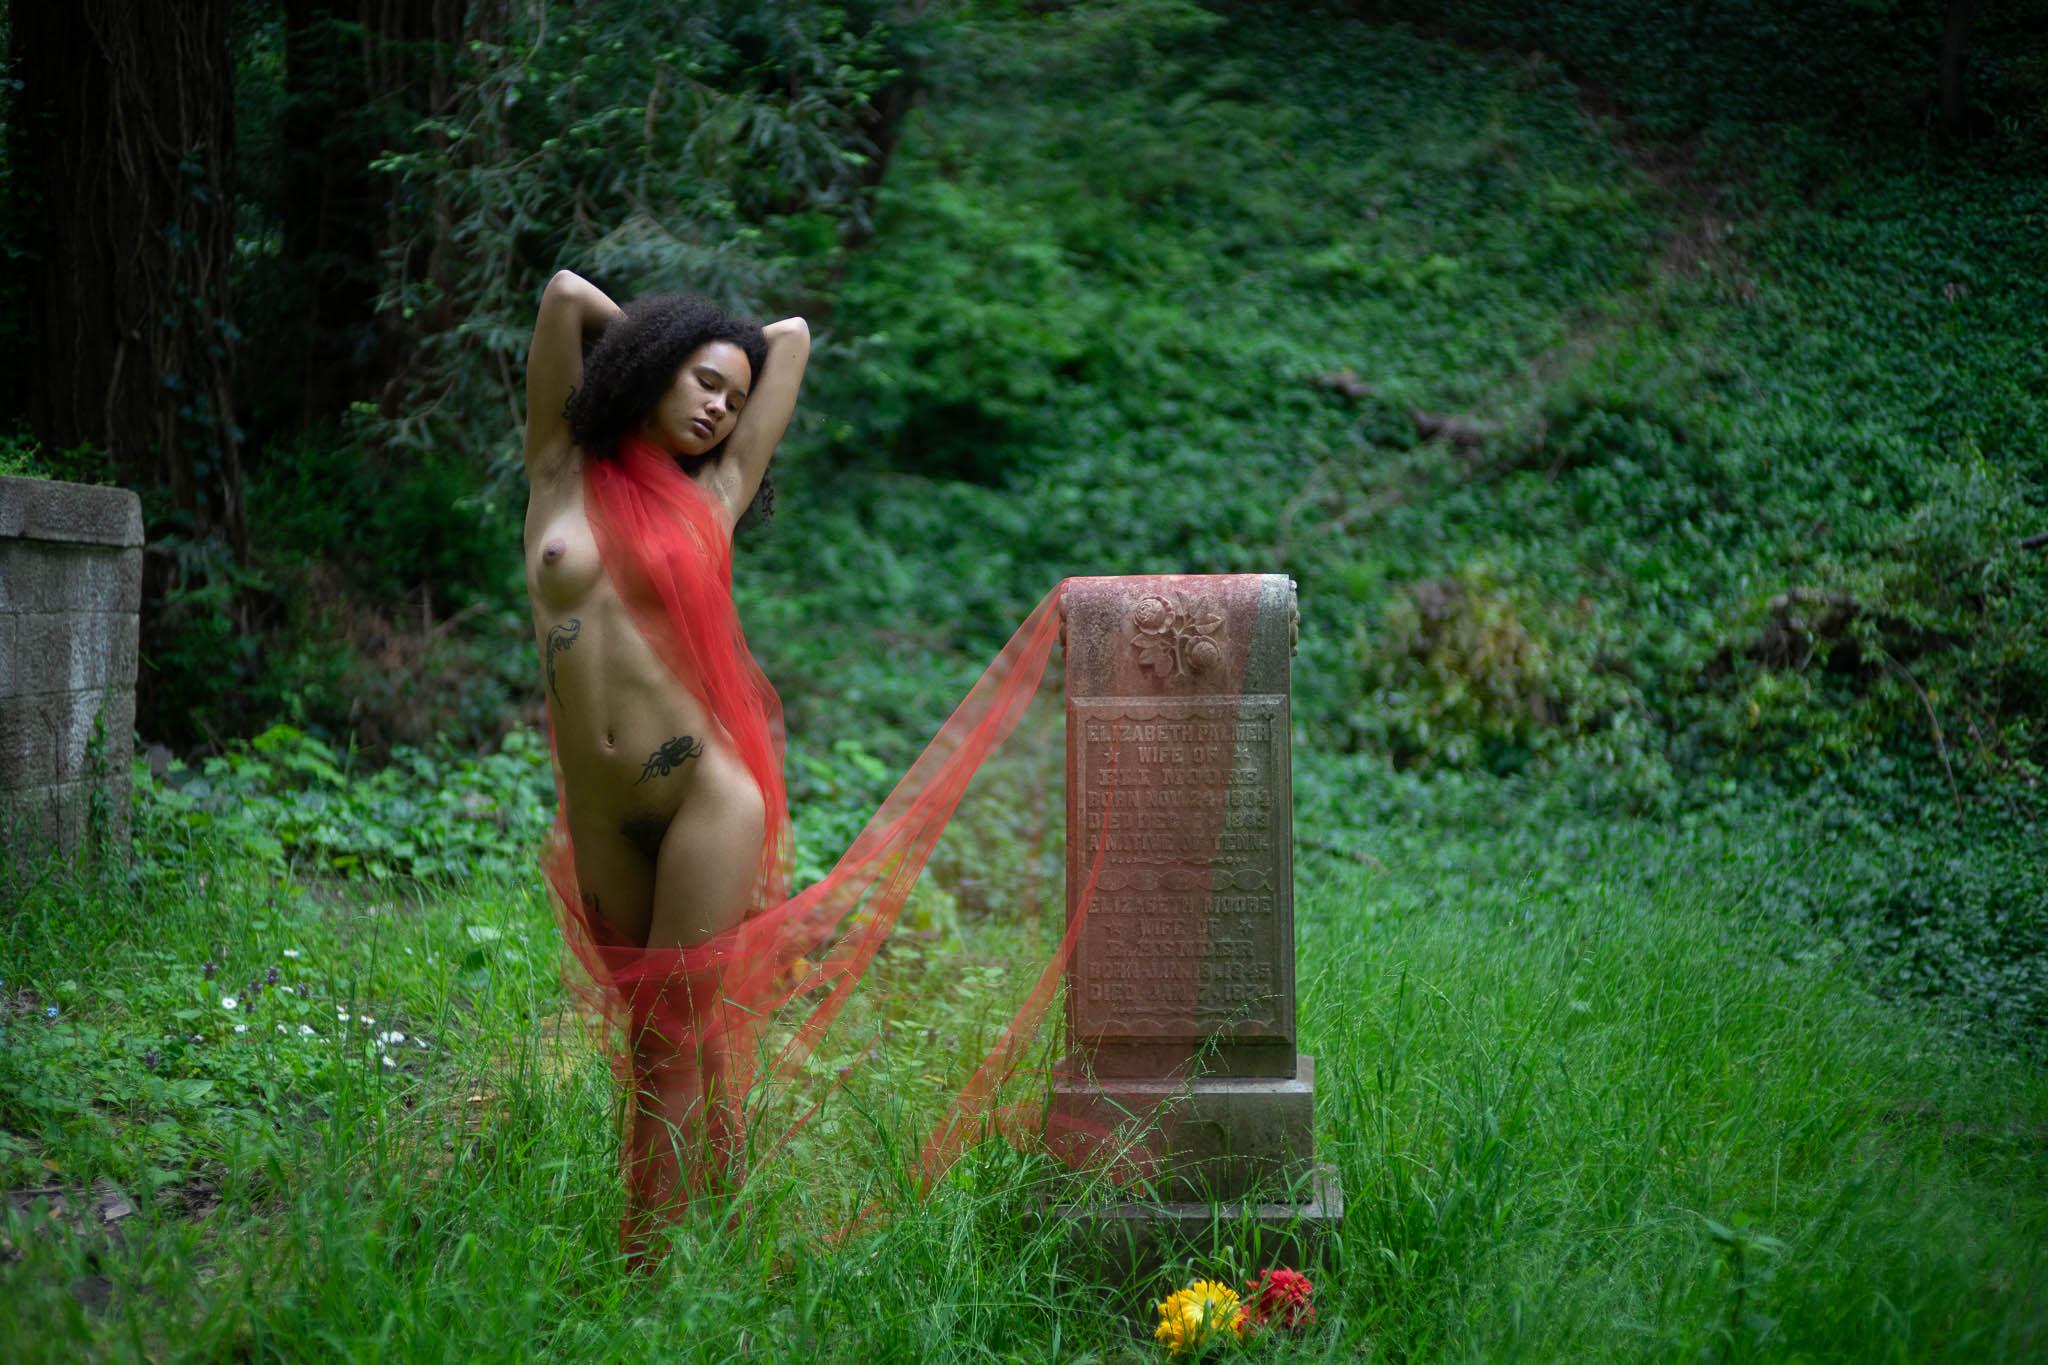 Patrice_Cemetery_20190609_09167_©2019ArgunTekant.jpg